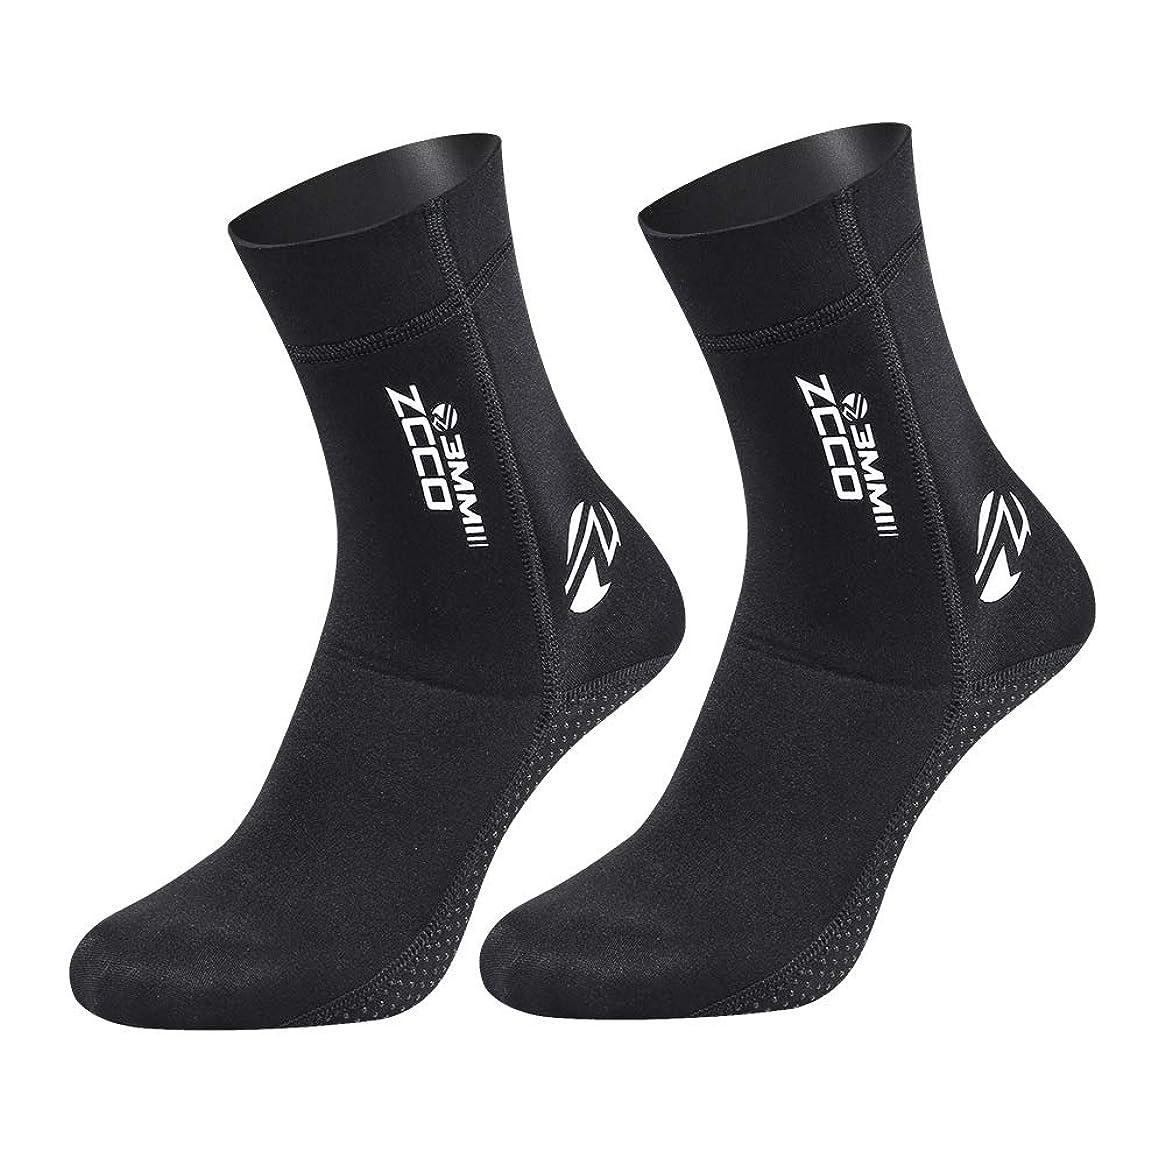 ZCCO Premium Neoprene Sock, 3mm Water Socks for Scuba Diving, Snorkeling, Beach, Surfing, Swimming, Sailing